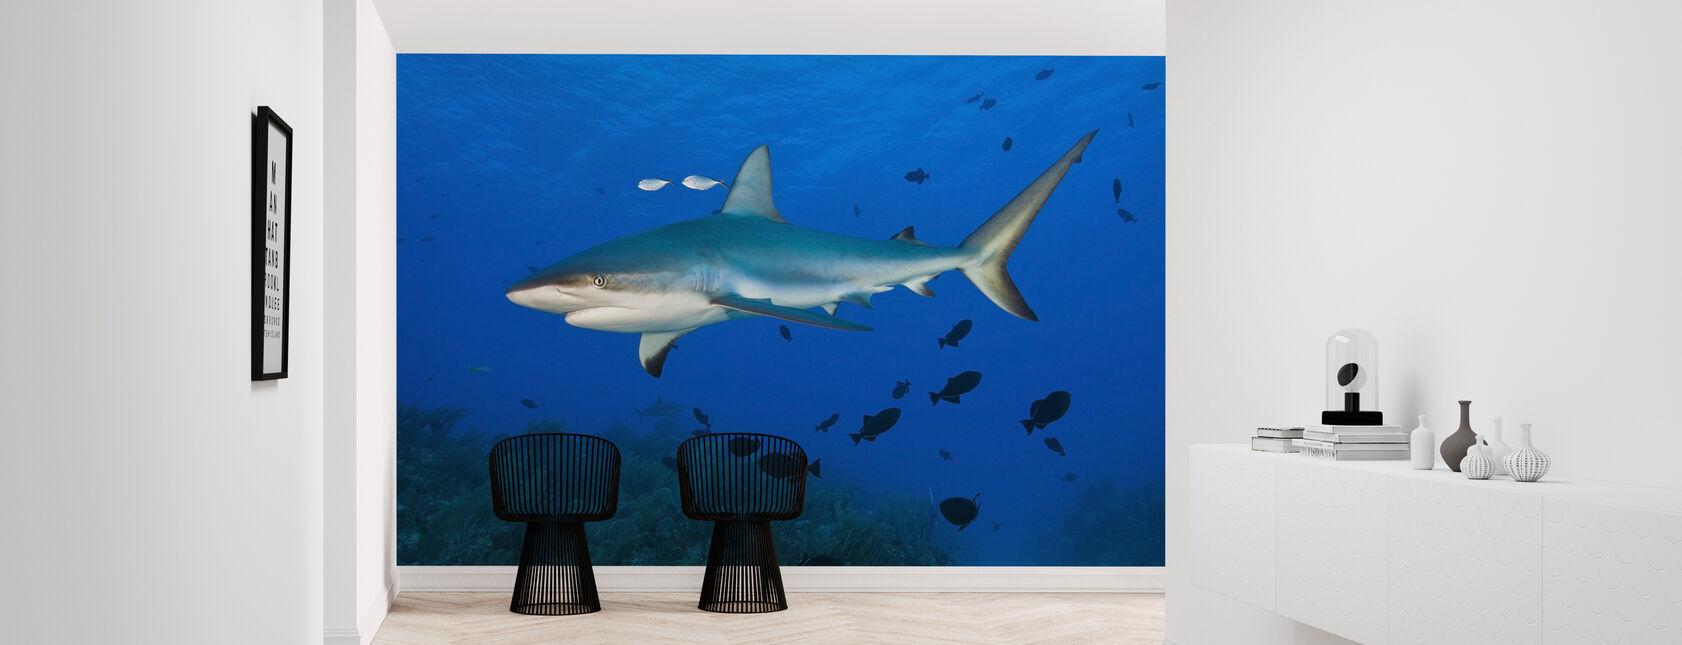 Caraïbische rif haai - Behang - Gang